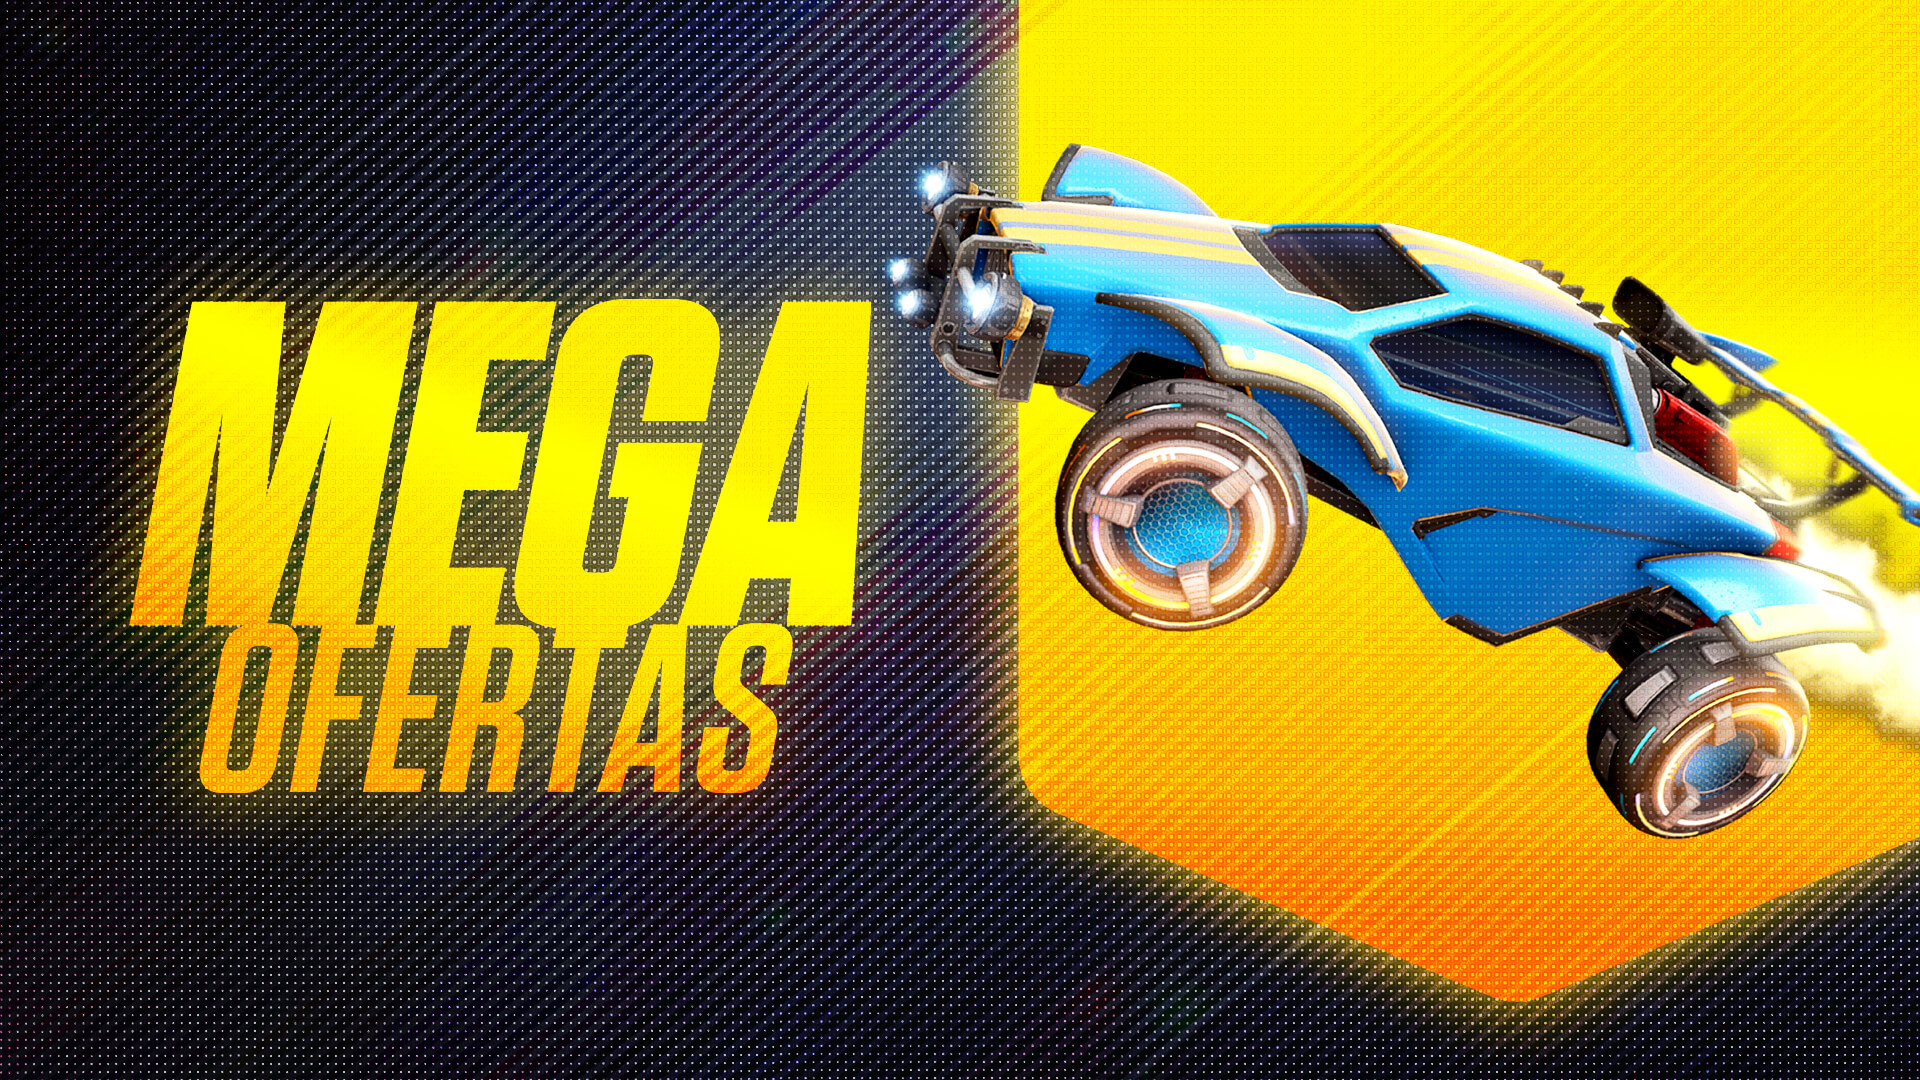 PT BR EGS MegaDeals RL 1920x1080